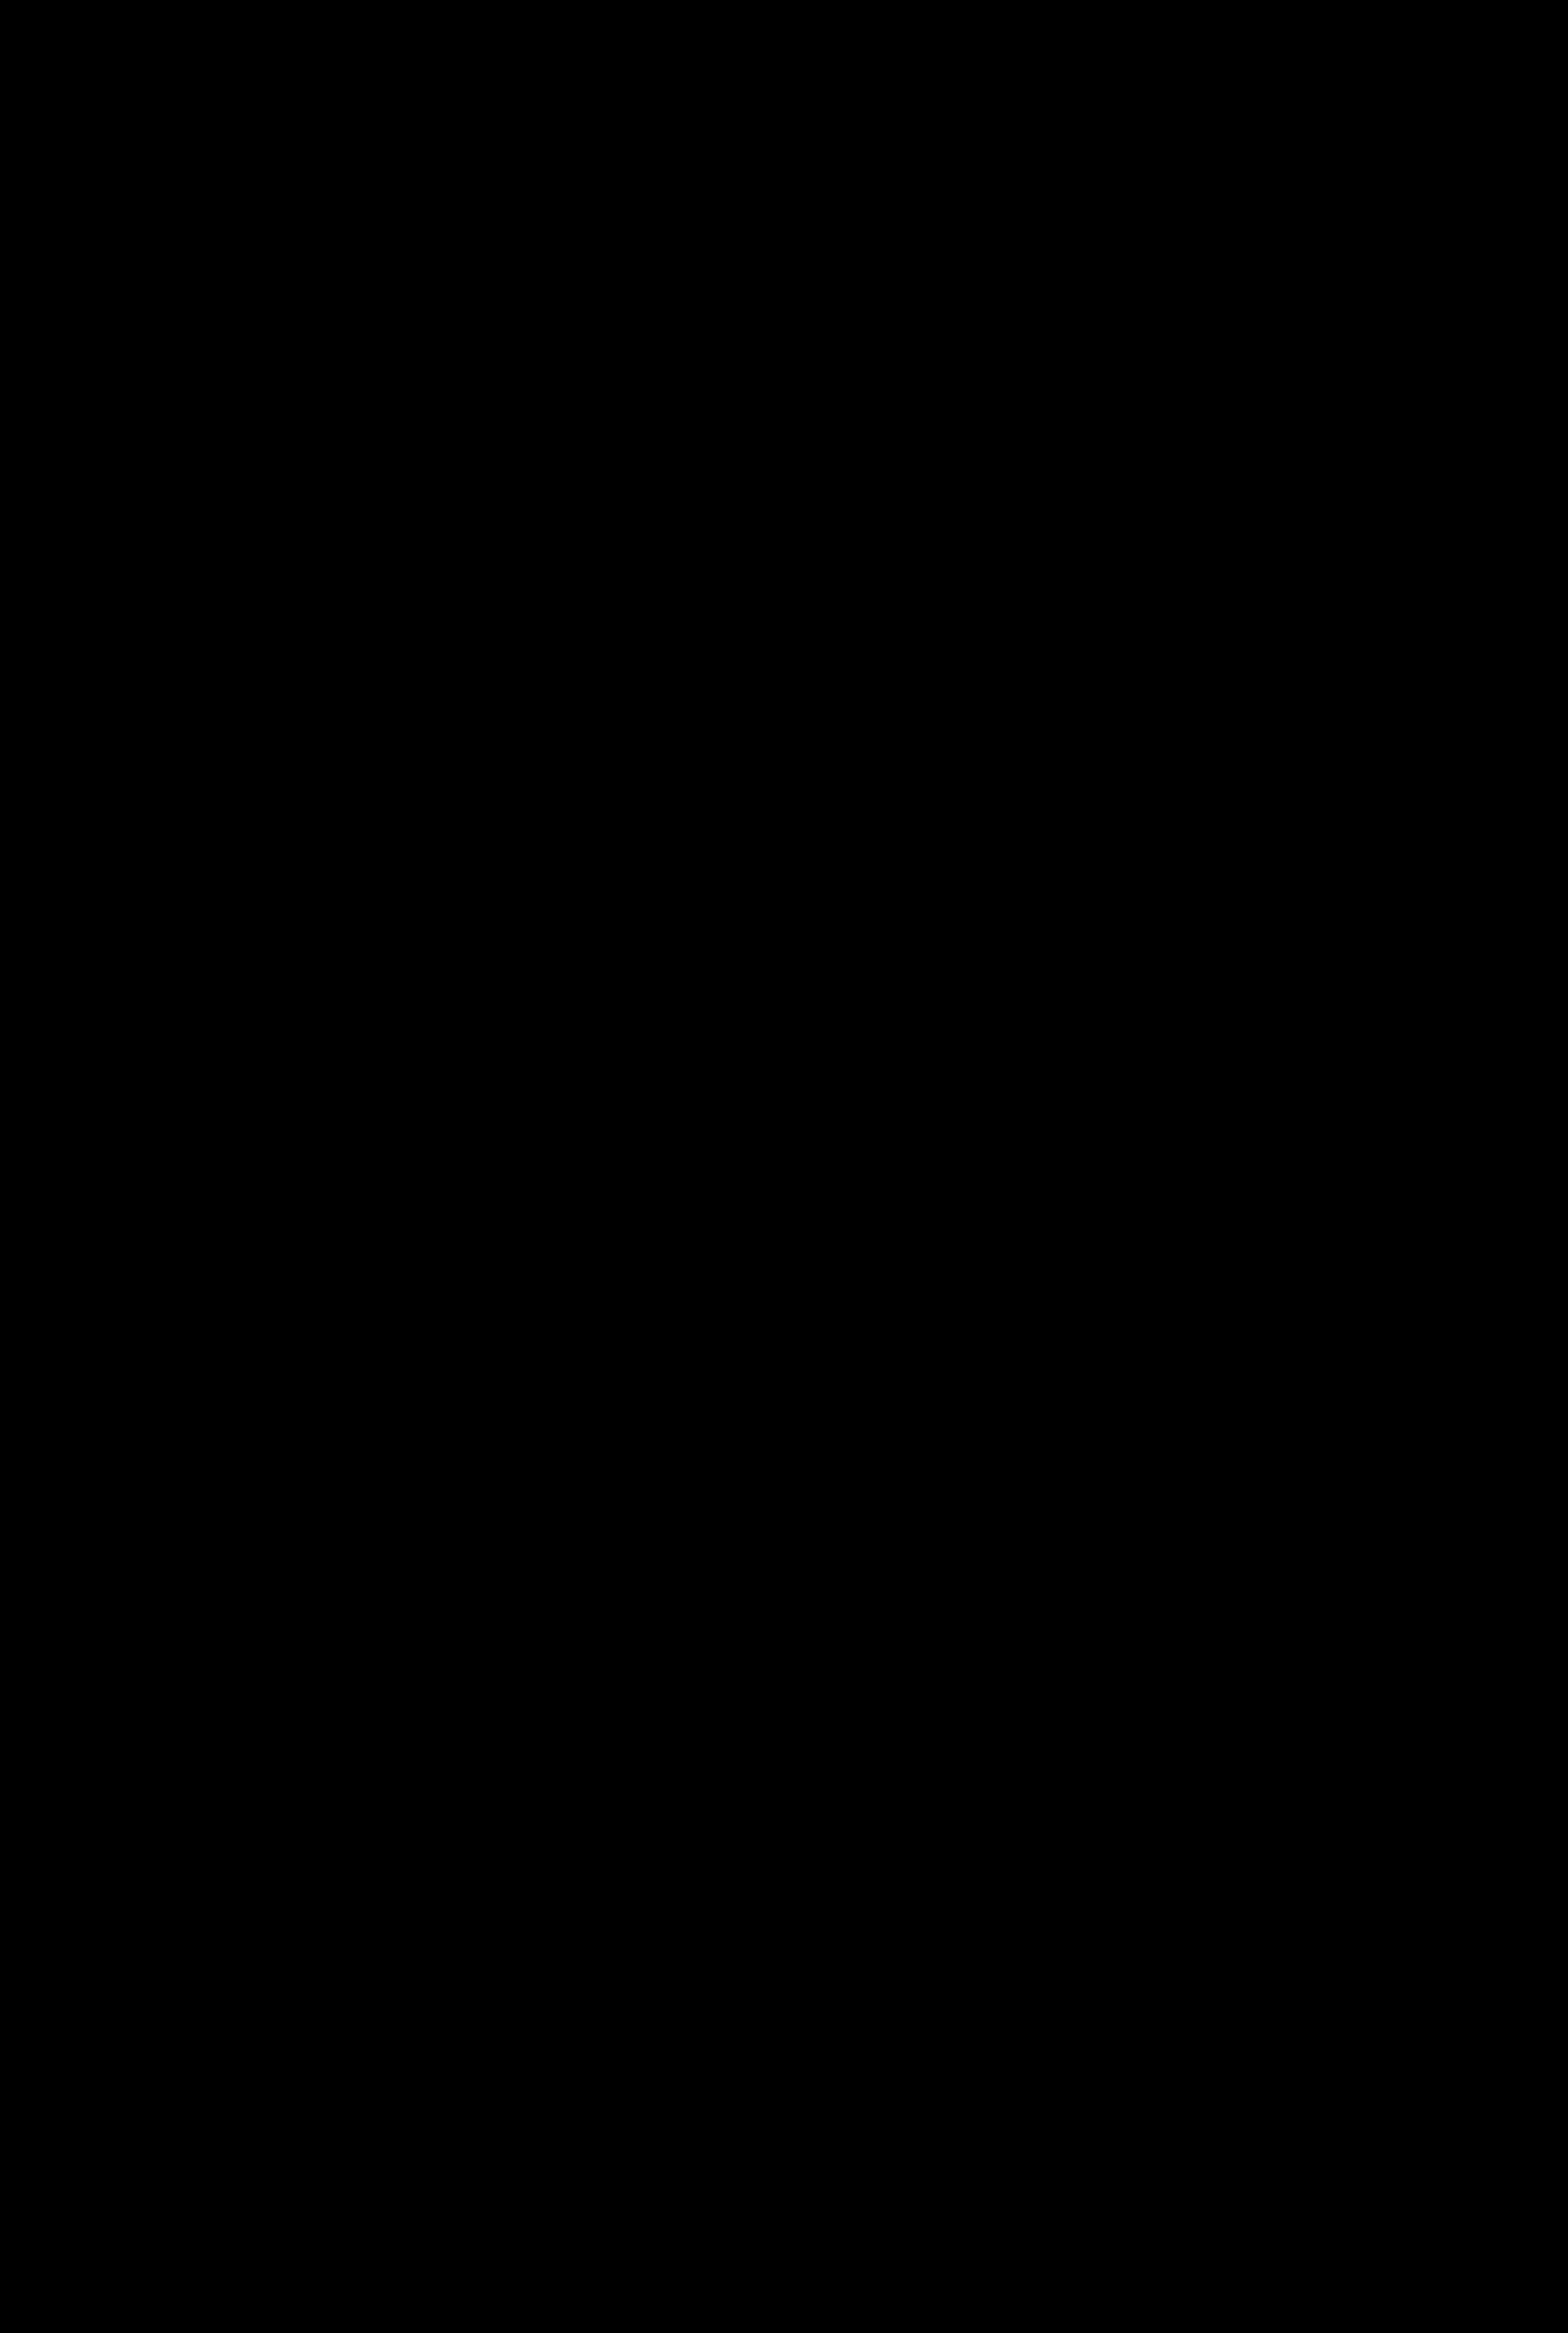 Dissertation peine de mort plan   report    web fc  com FC  Dissertation au sujet de la peine de mort   Cyberprofs com